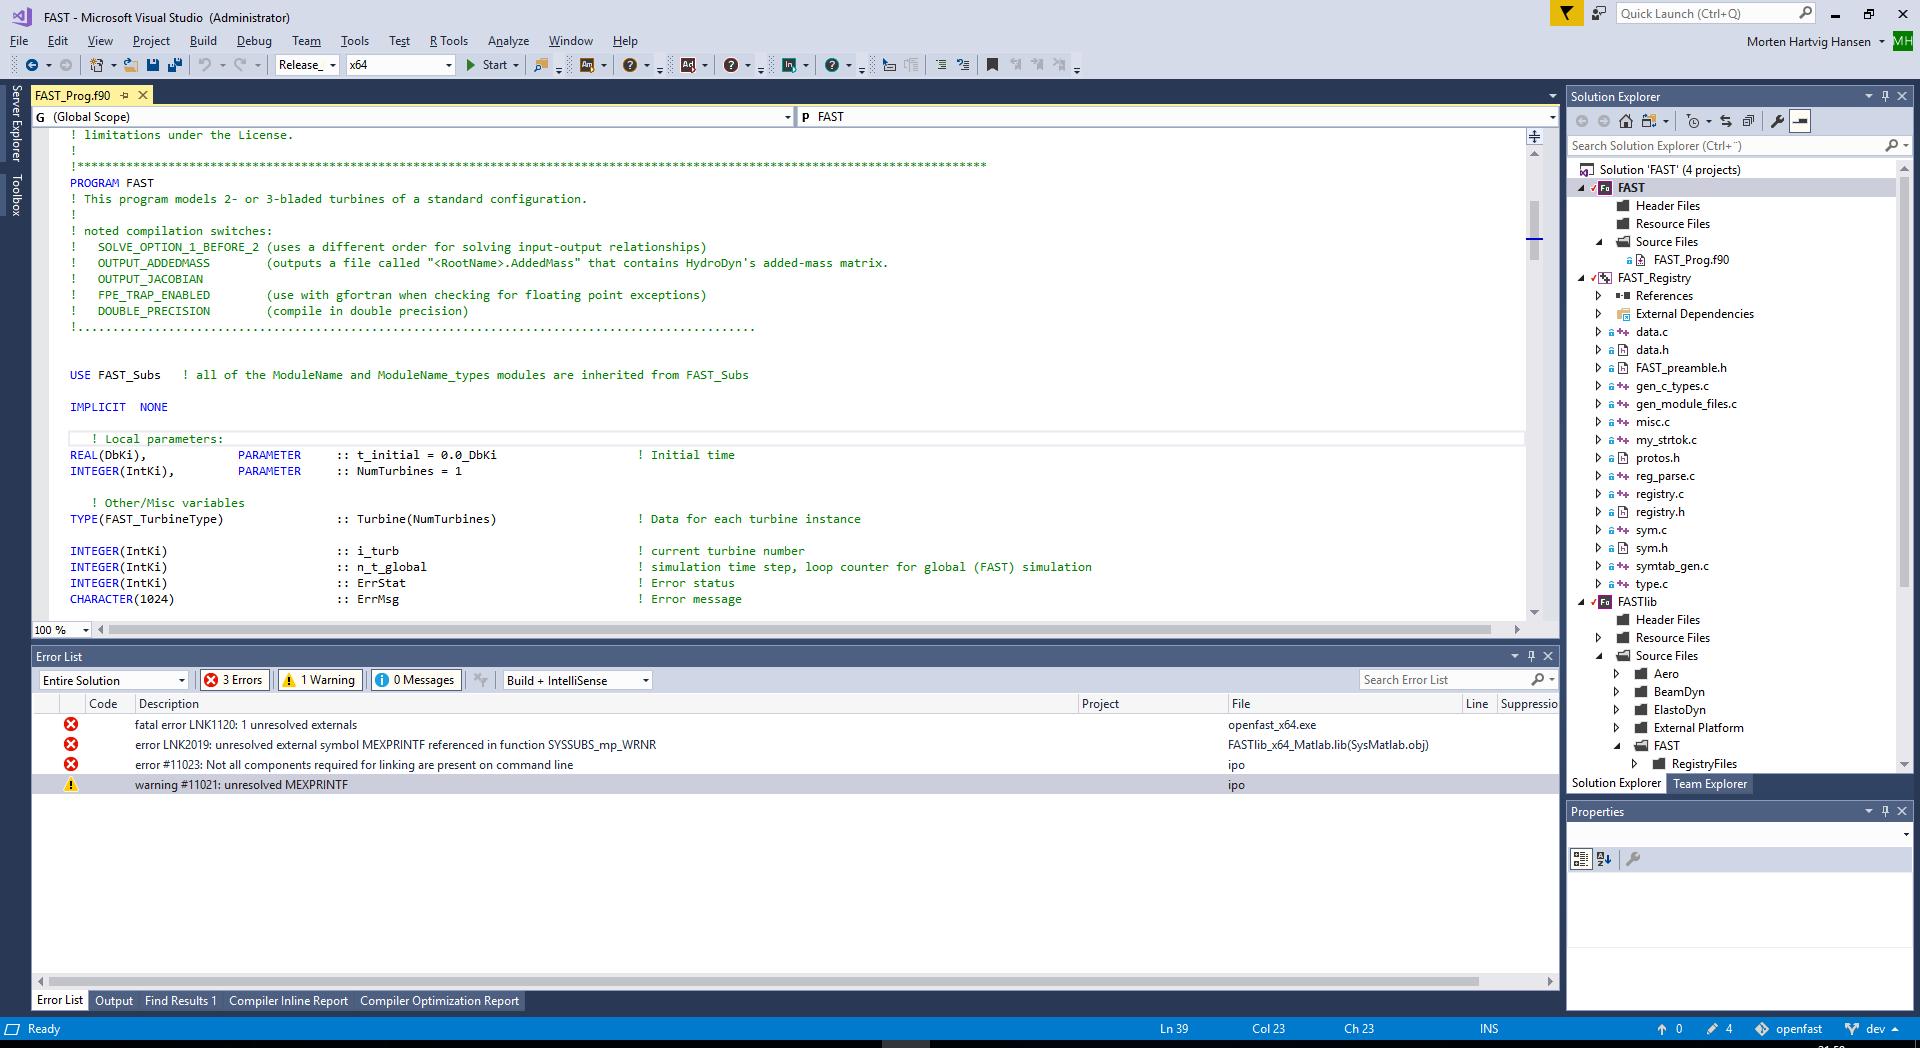 Issue running OpenFAST with Simulink · Issue #198 · OpenFAST